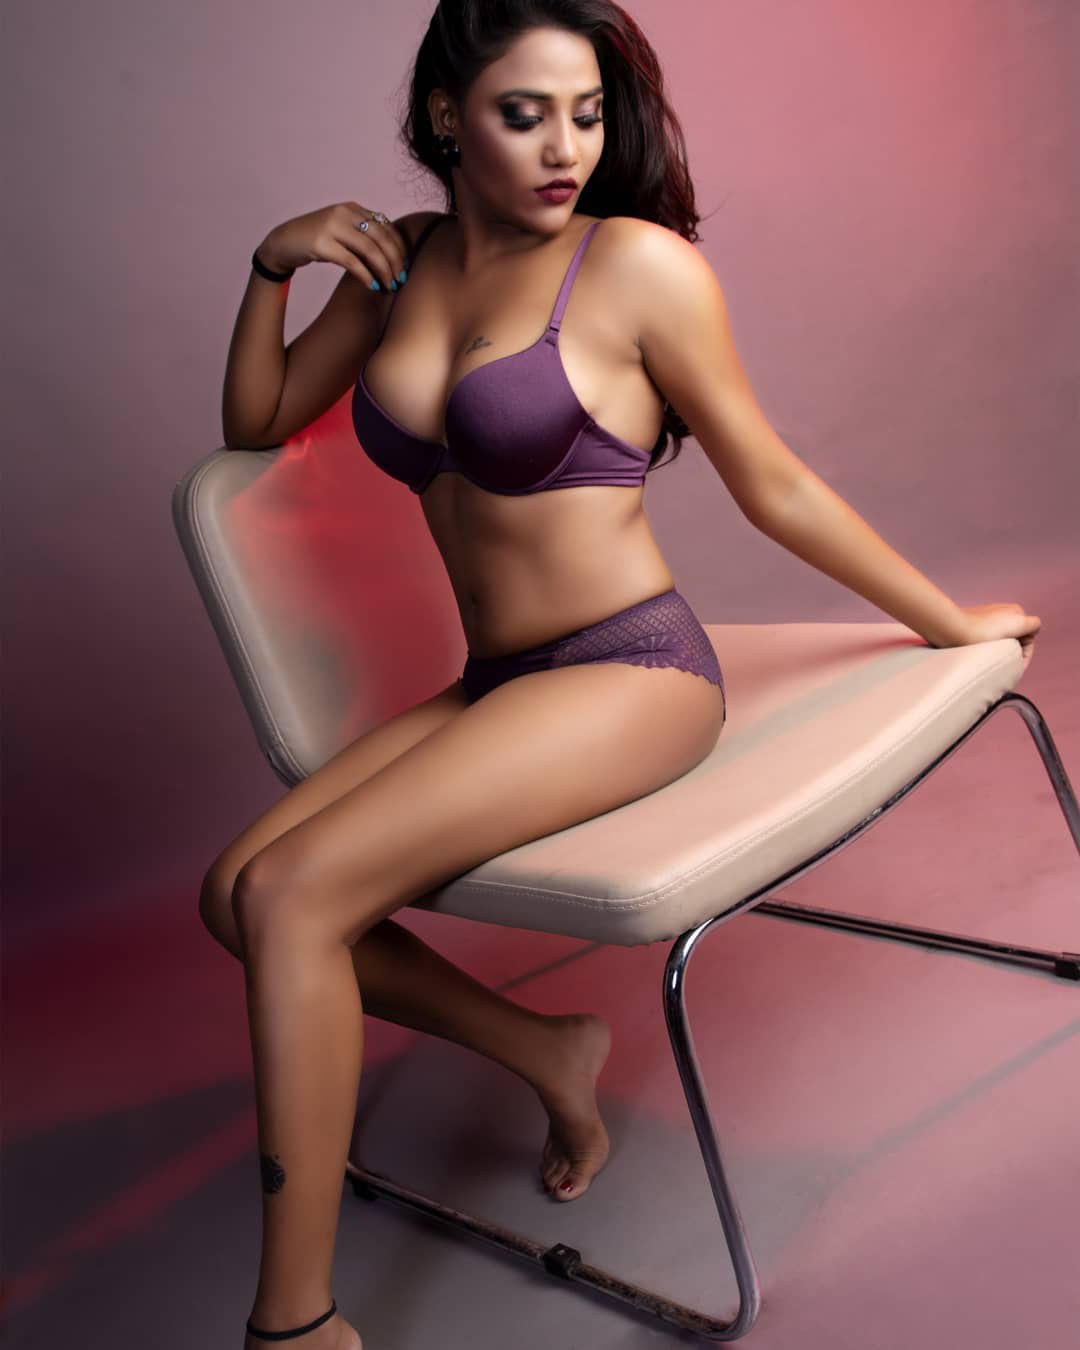 Bikini Actresses Rukmani Khandagale Bold And Hot Photos